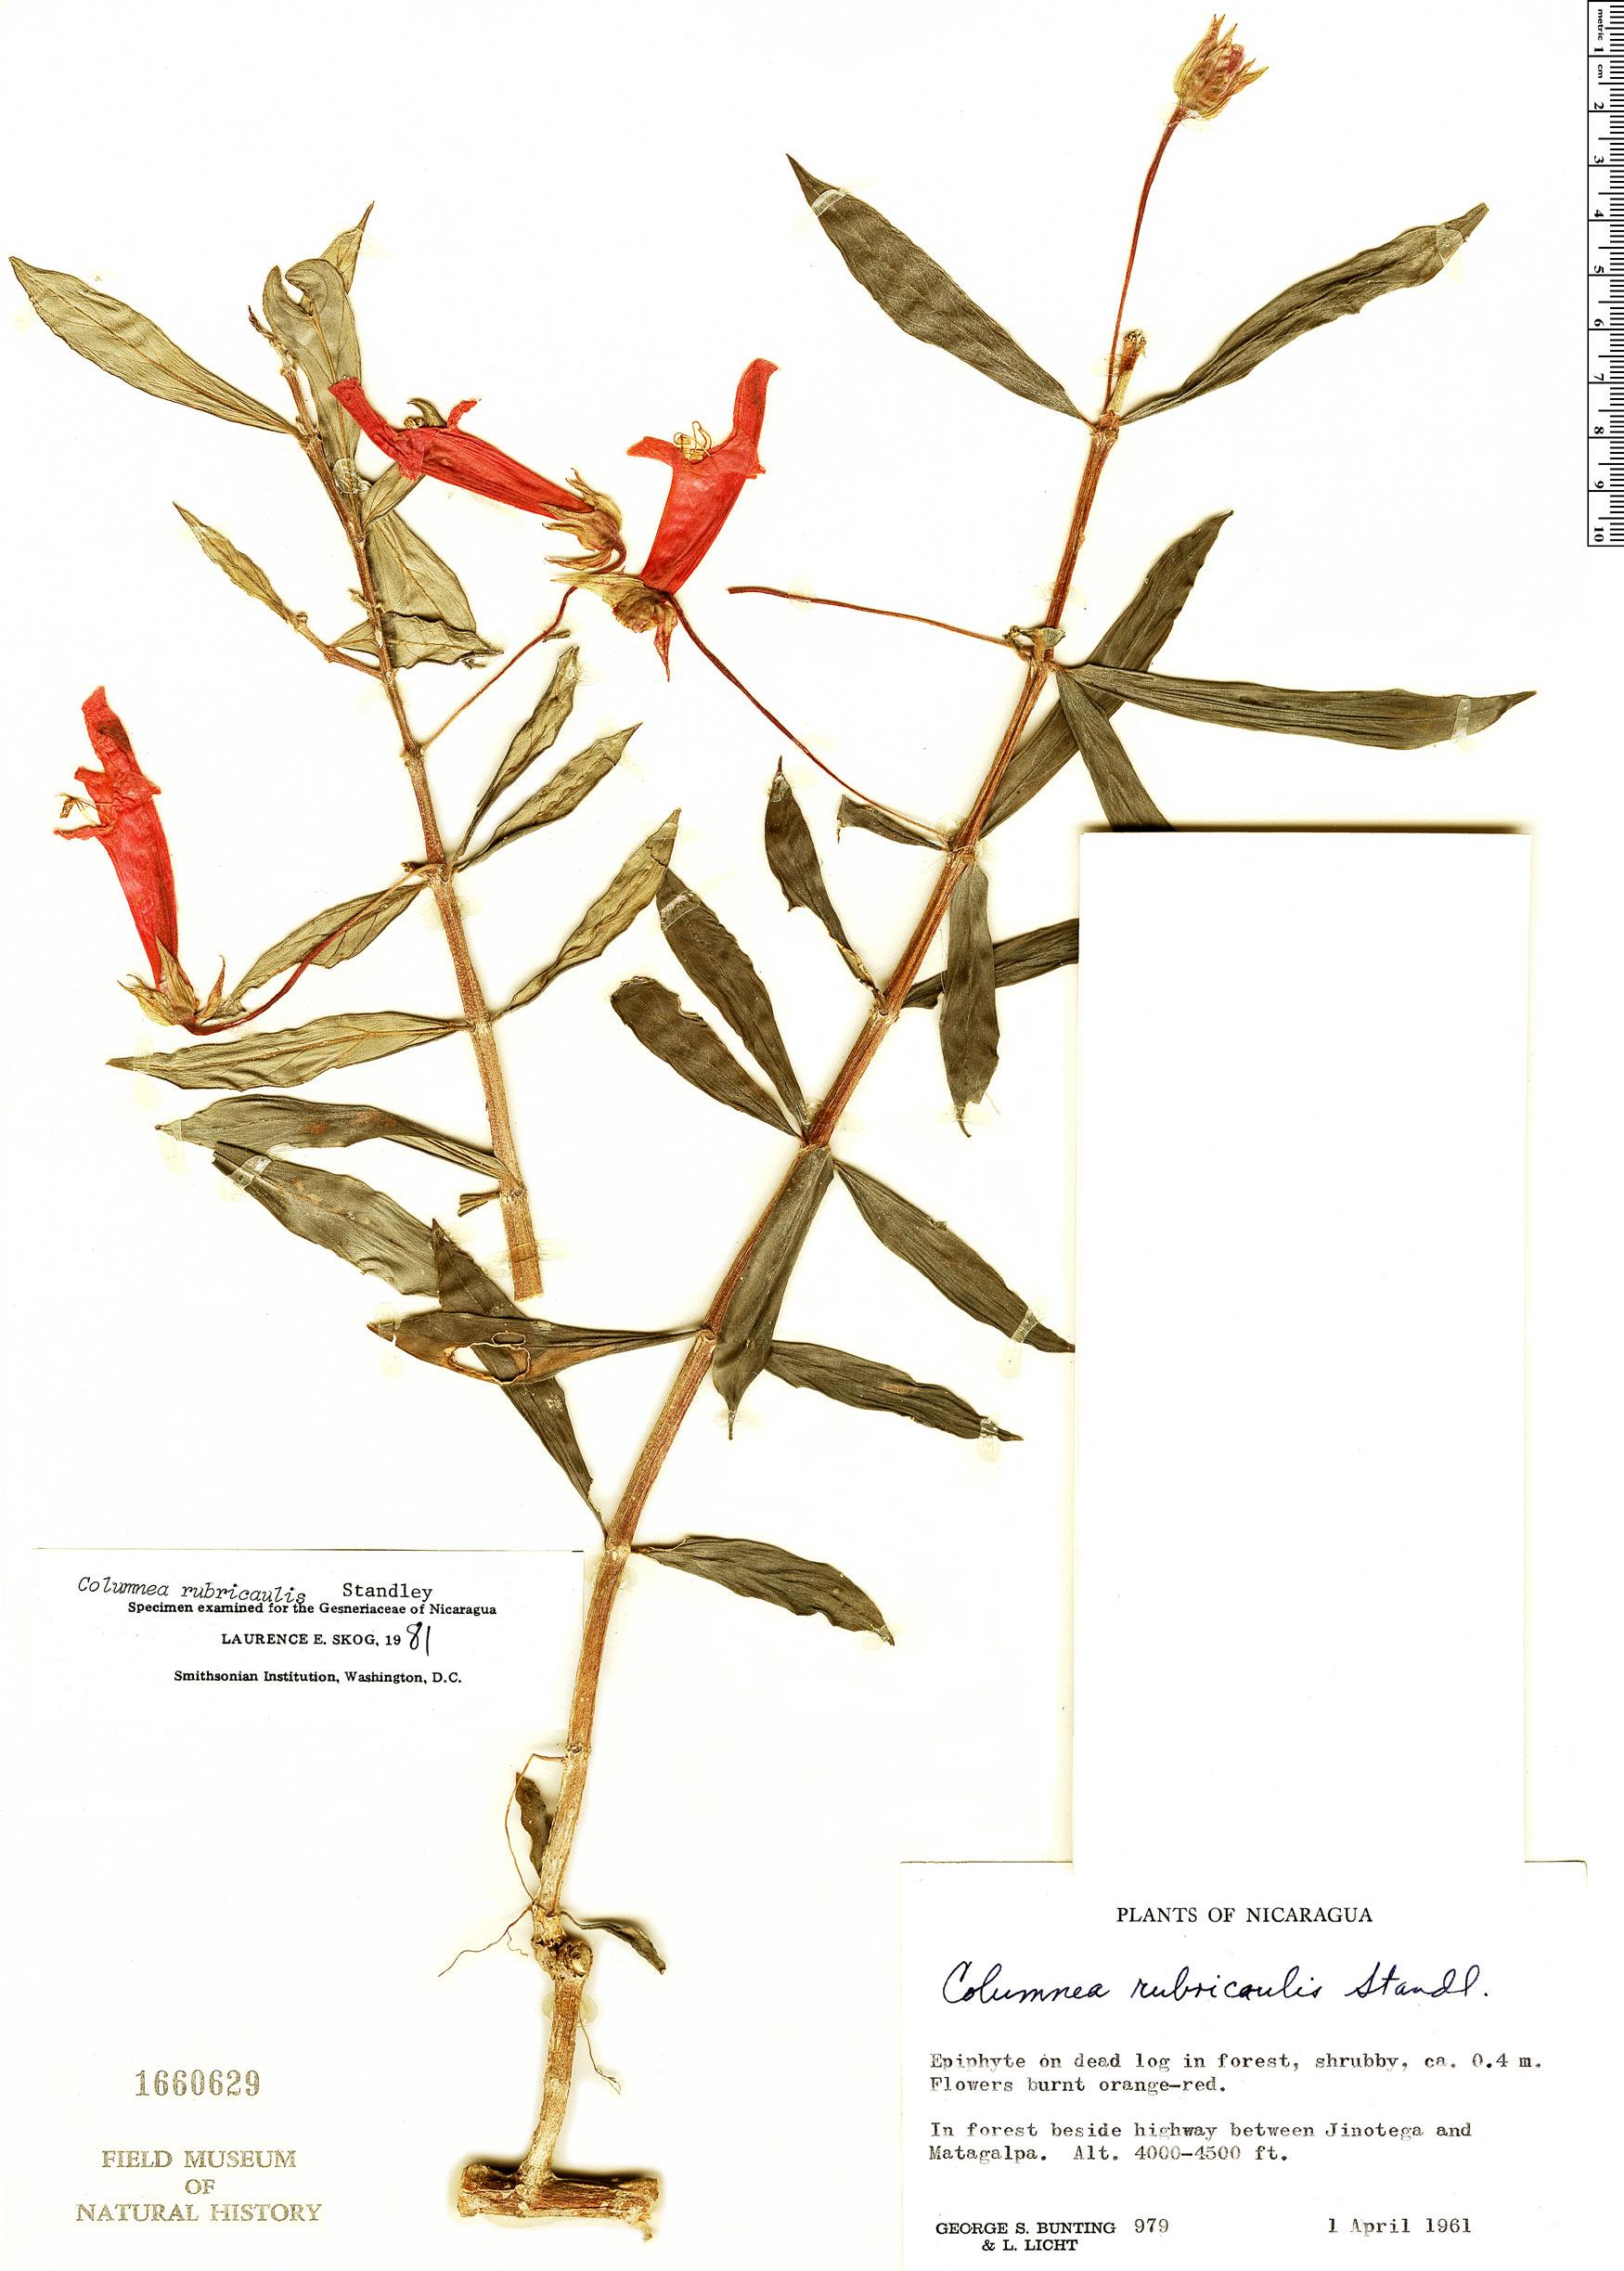 Specimen: Columnea rubricaulis